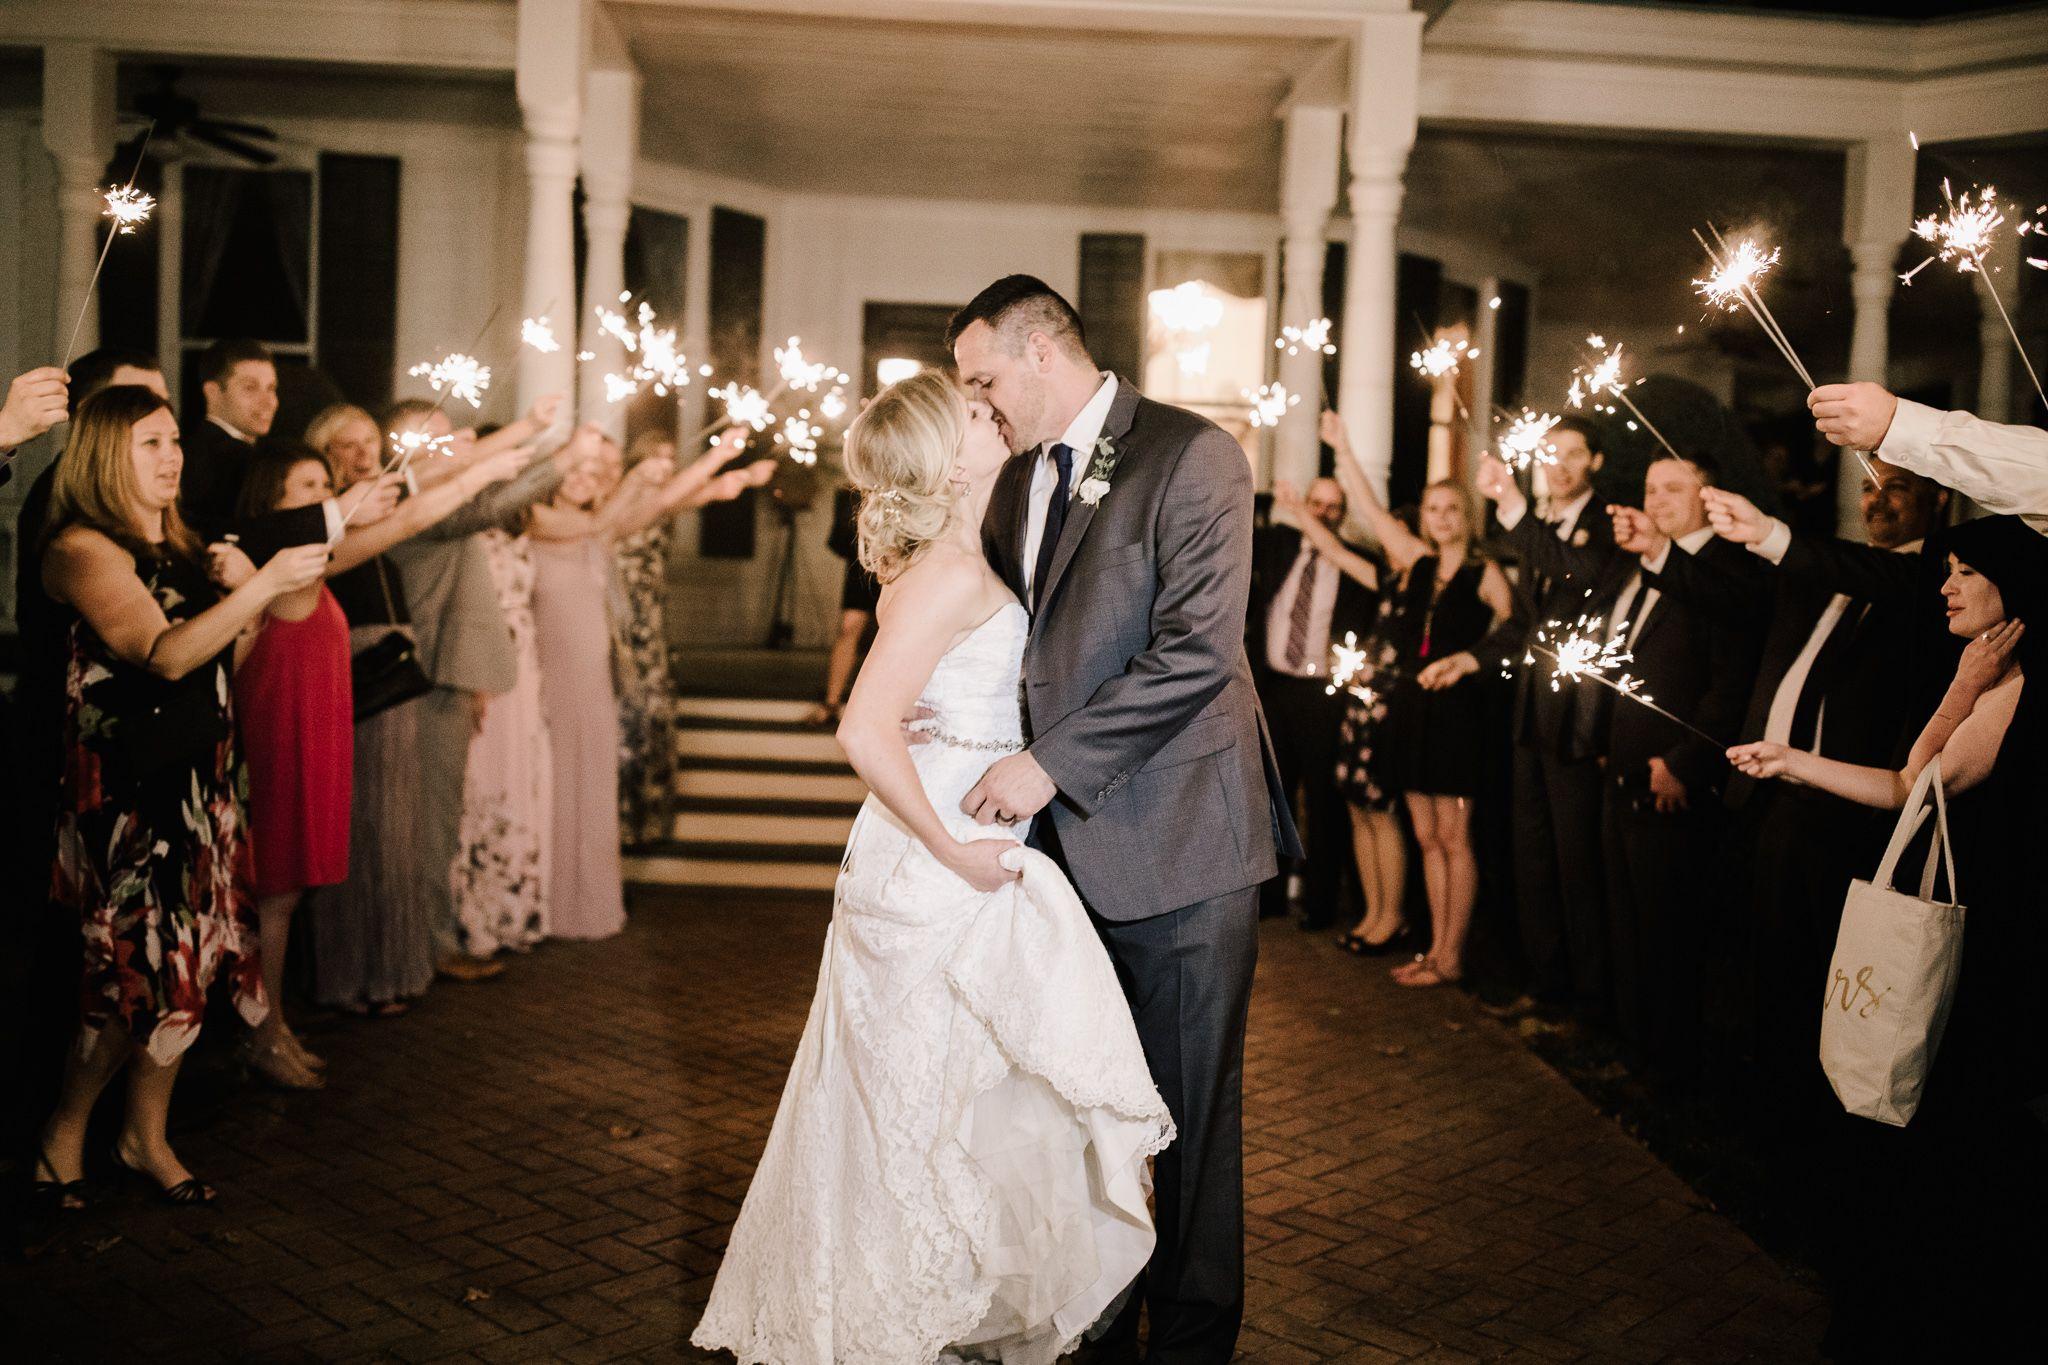 Jordan Alex Goare With Images Wedding Sparklers Lace Weddings Wedding Dresses Lace